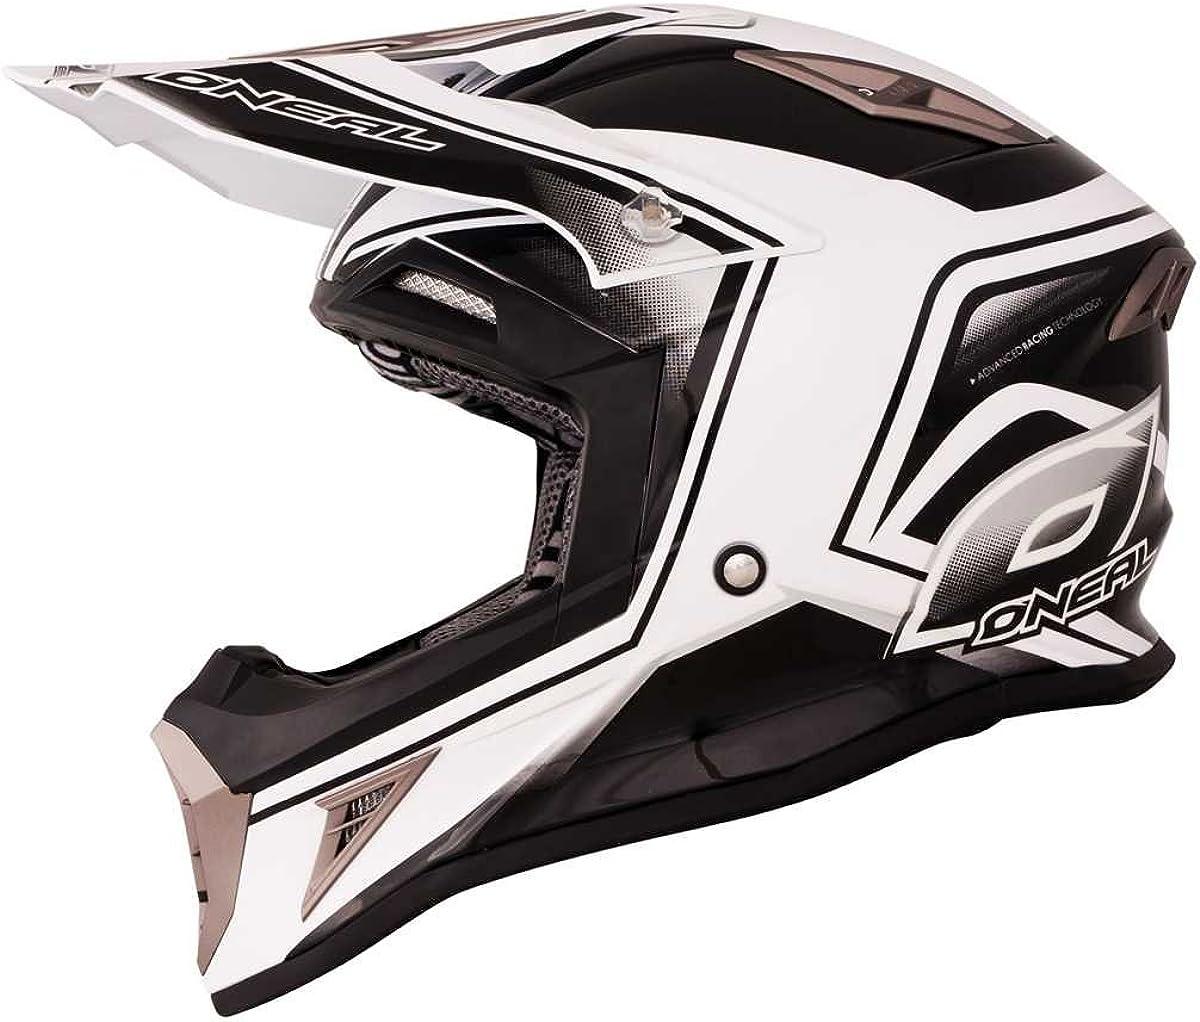 O Neal Oneal 10 Series Cahuilla Creek Mx Helm Farbe Schwarz Weiss Größe S 55 56 Bekleidung